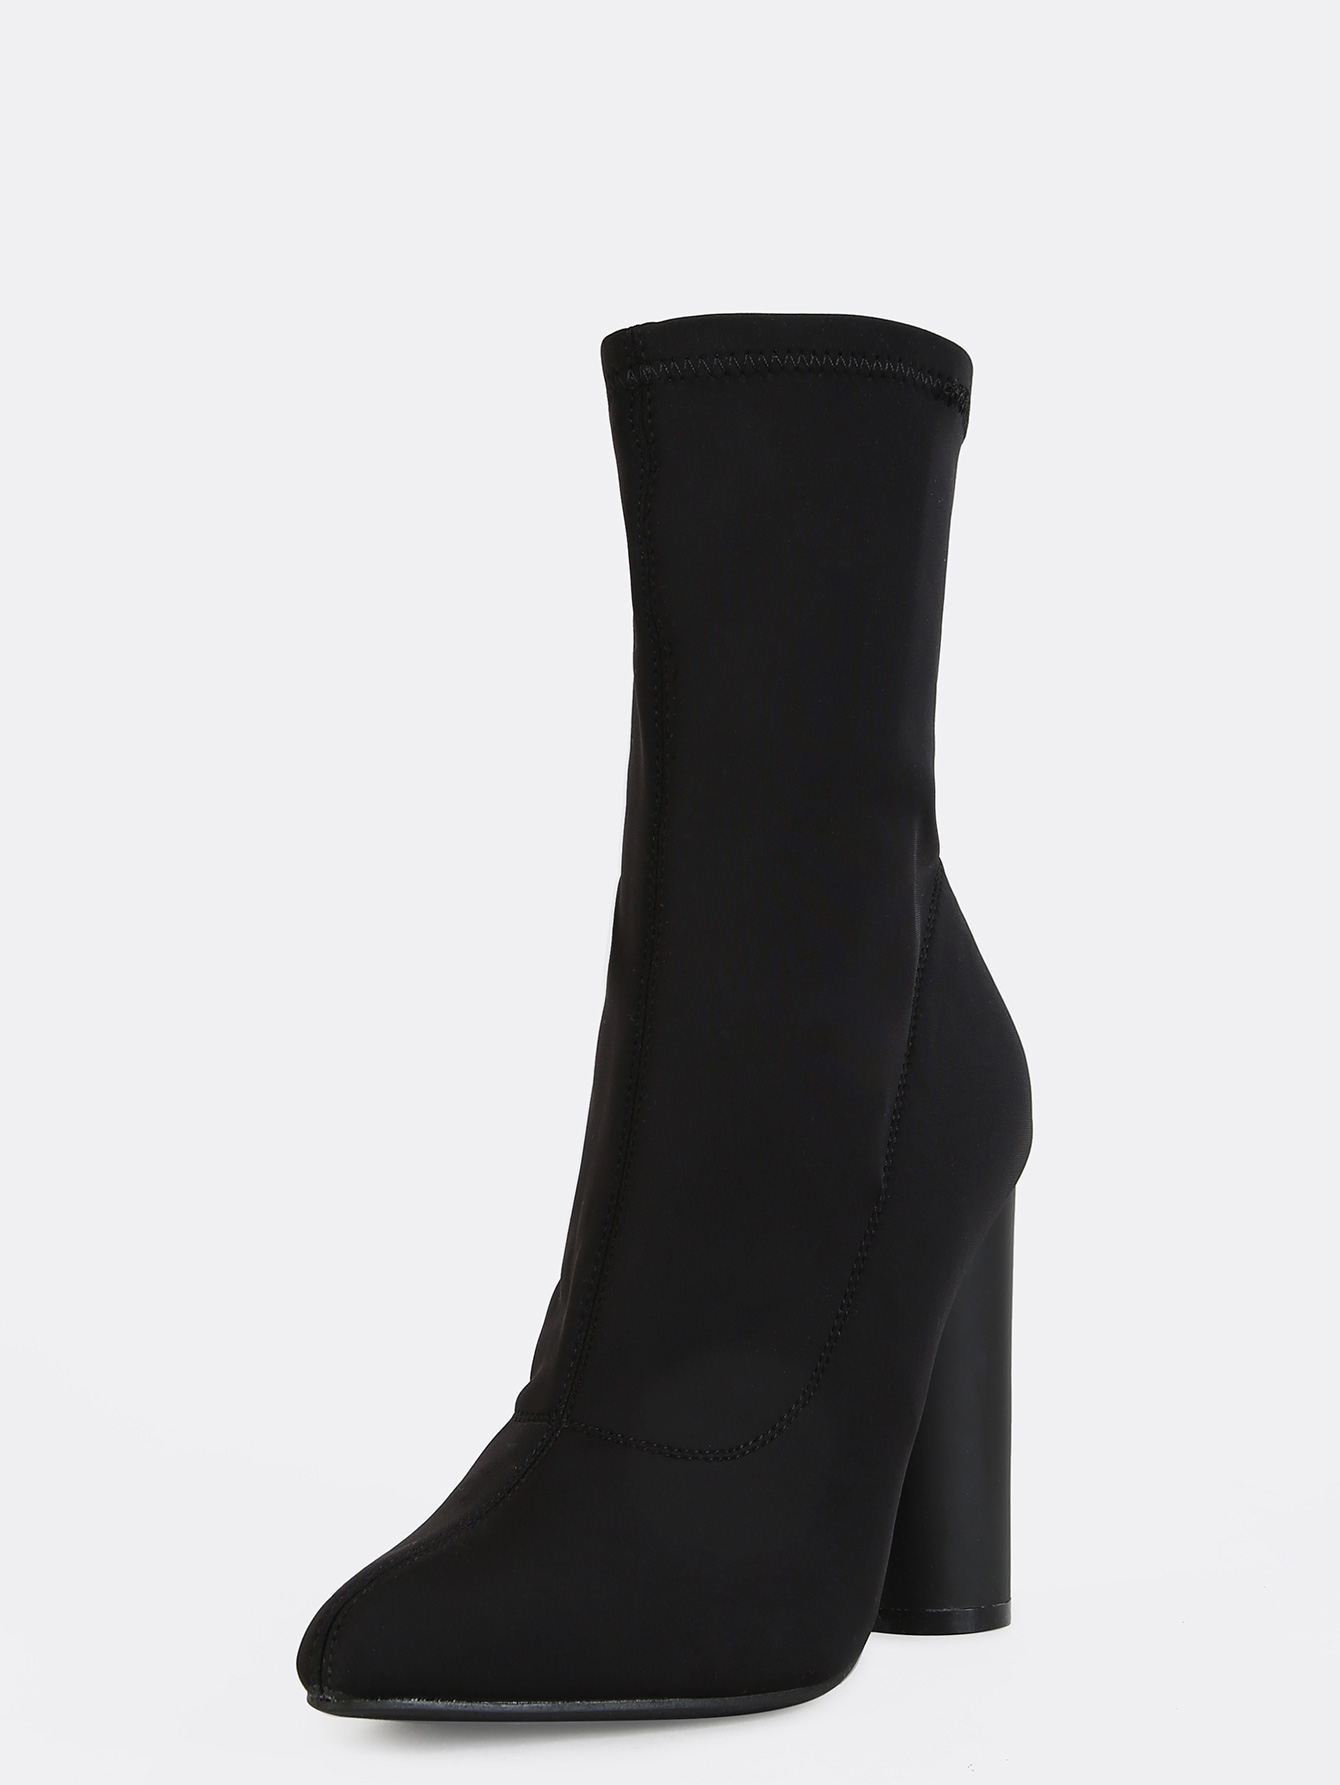 8201b0977a Pointy Toe Cylinder Heel Boots BLACK -SheIn(Sheinside)